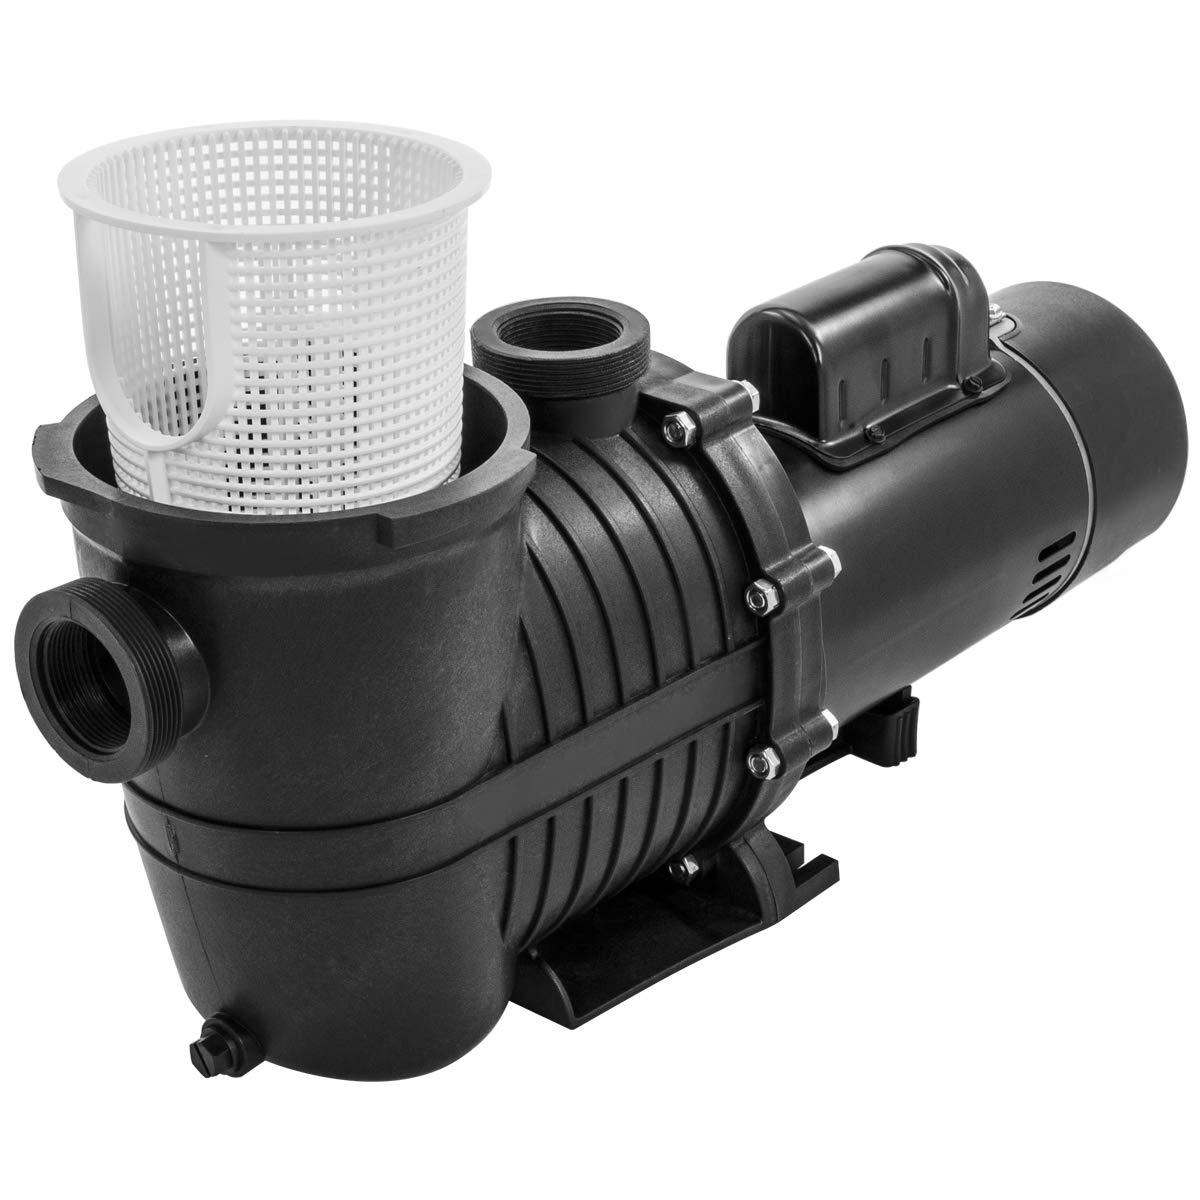 Amazon.com : XtremepowerUS 2HP Swimming Pool Pump (Dual-Speed) 230V ...